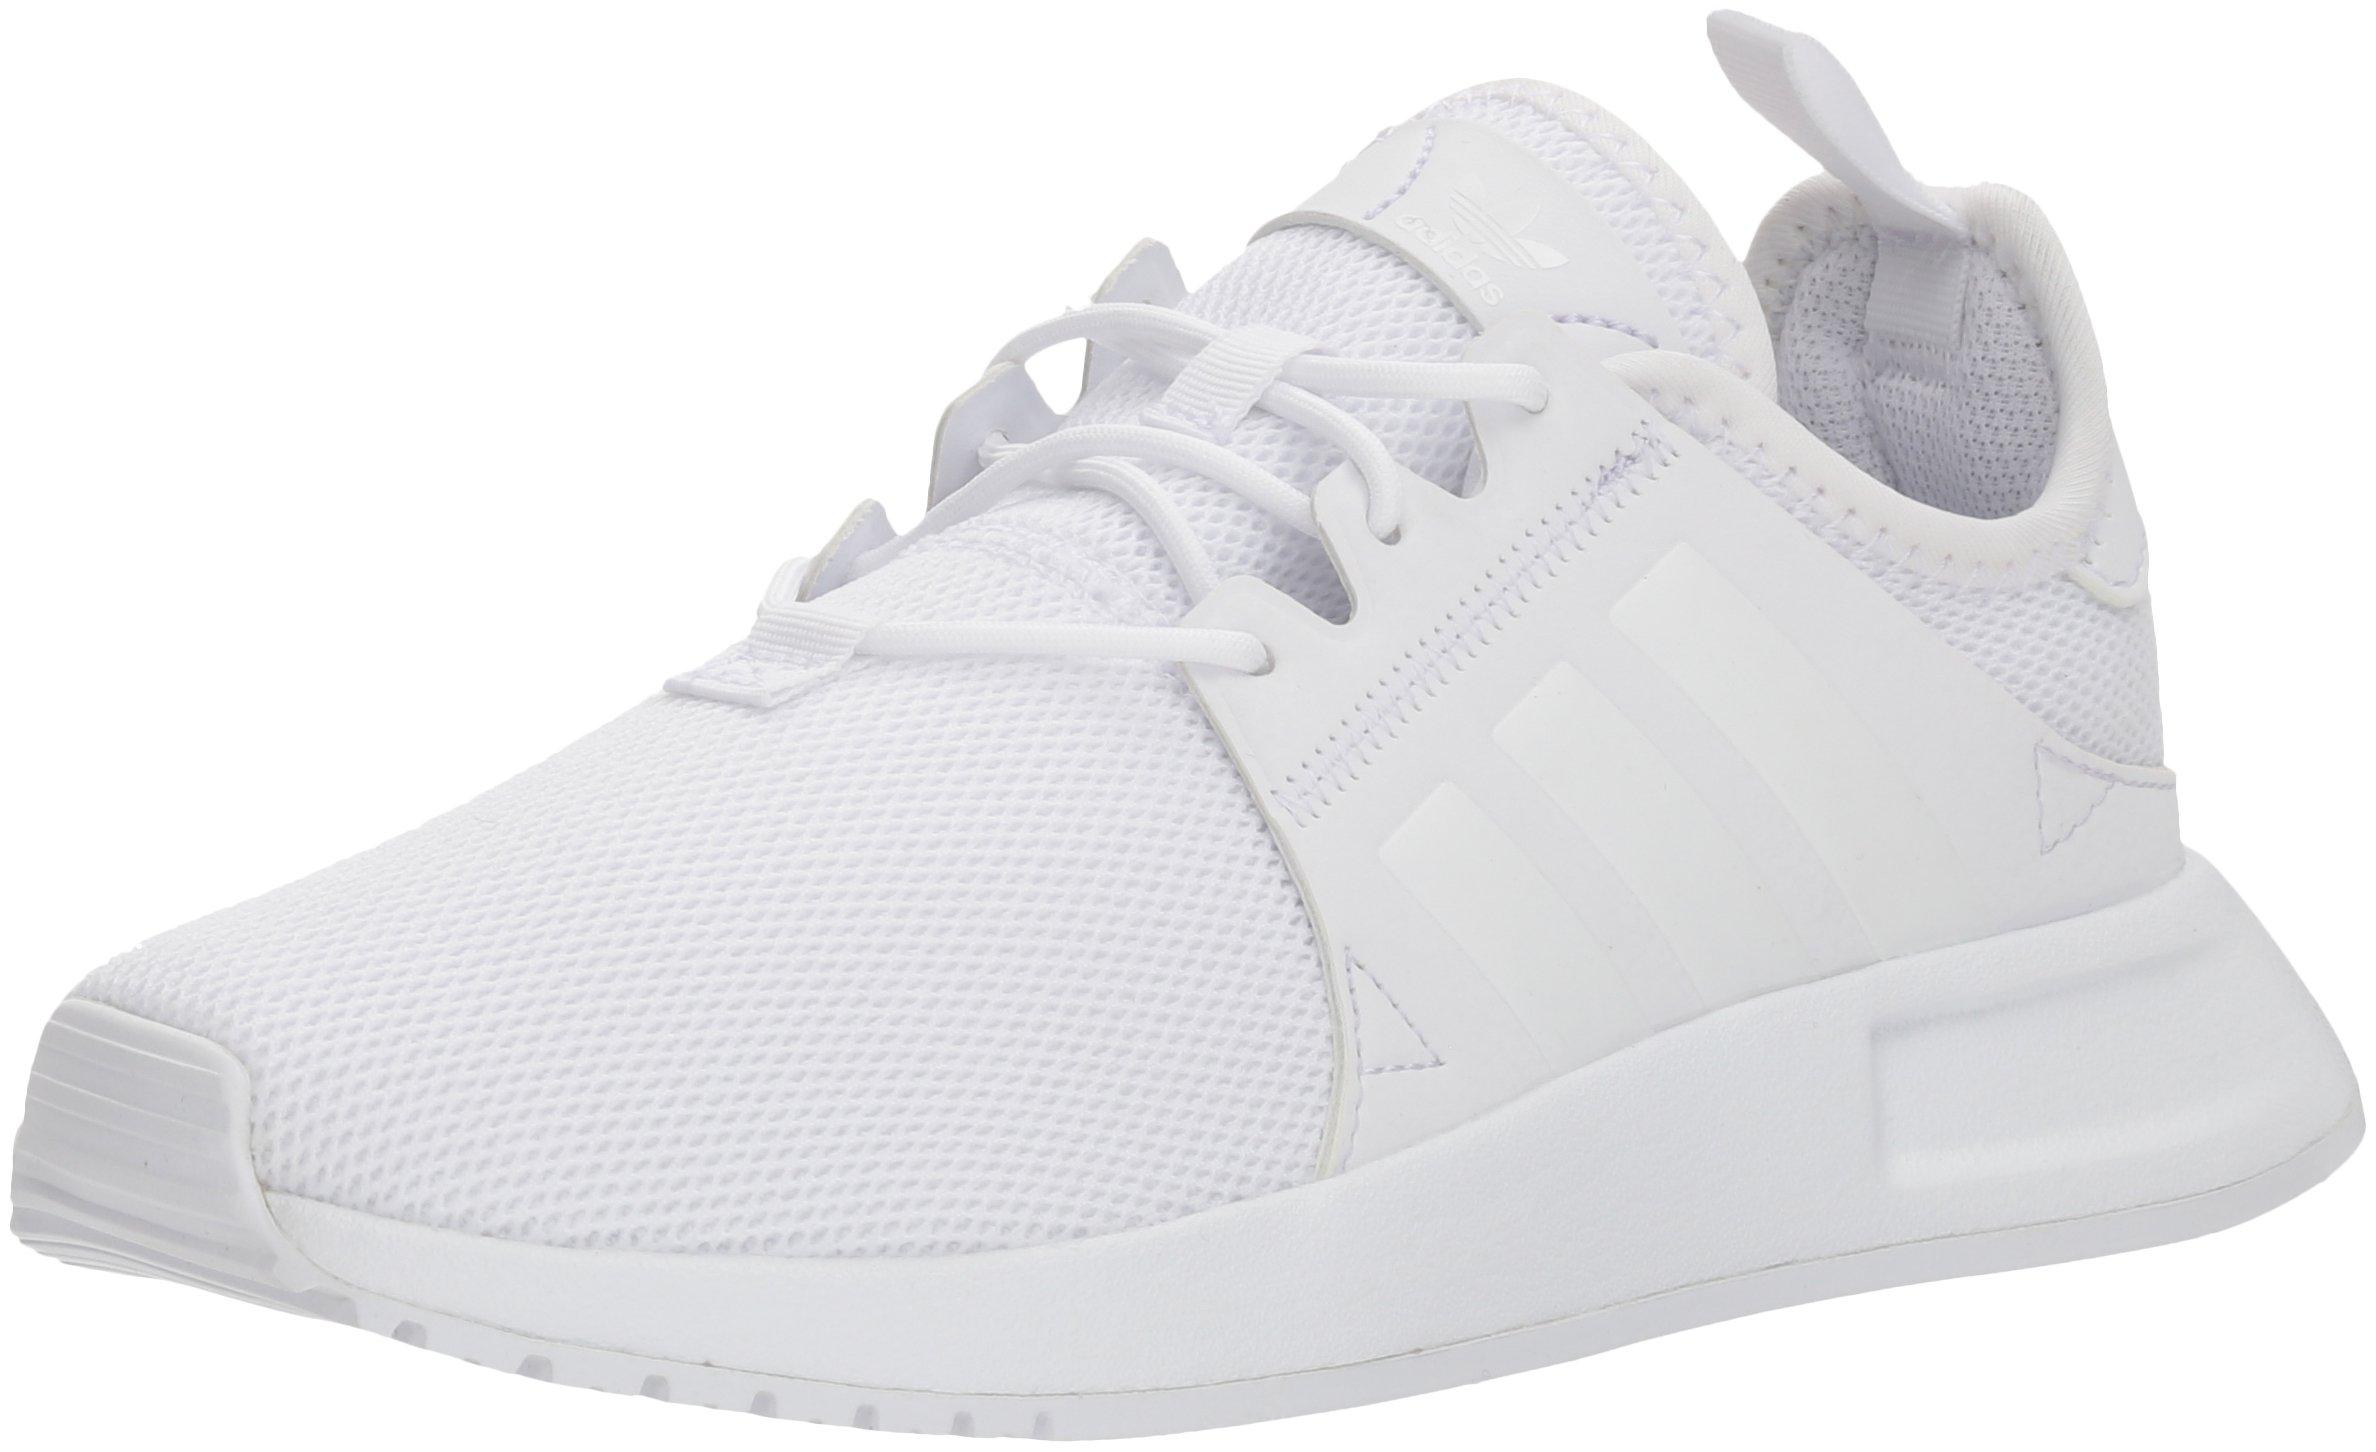 bea89b204f941 Galleon - Adidas Originals Unisex X_PLR J Running Shoe White, 6.5 M US Big  Kid